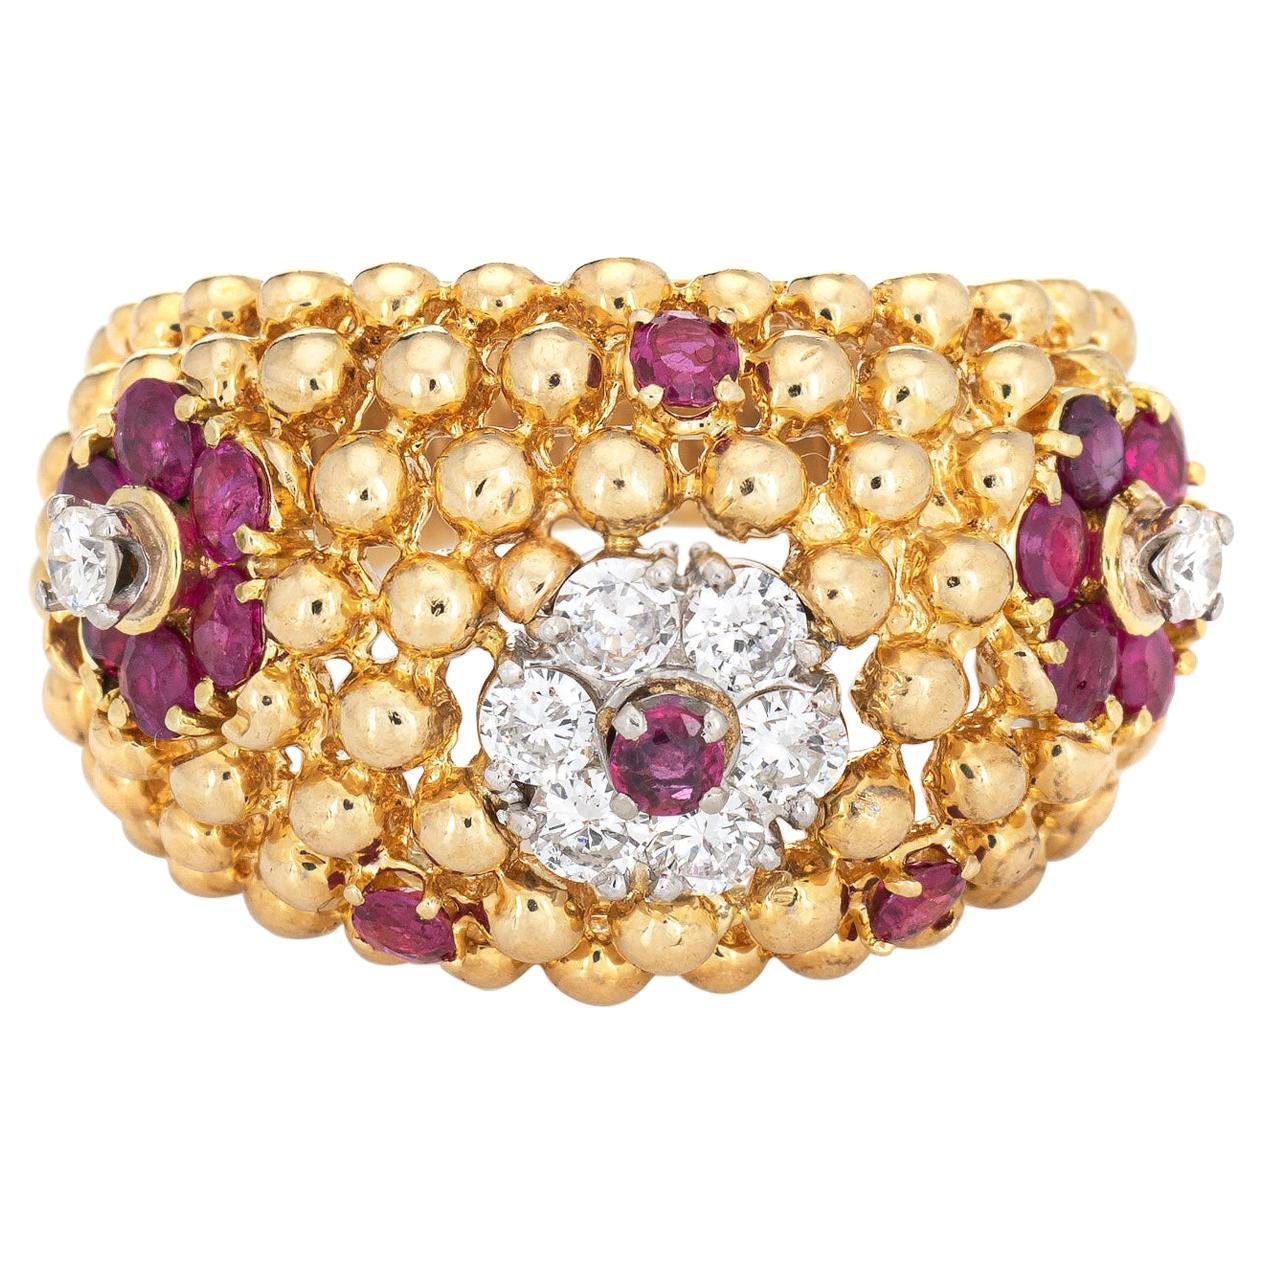 Ruby Diamond Ring Domed Flower 18 Karat Gold Band Vintage Jewelry Estate